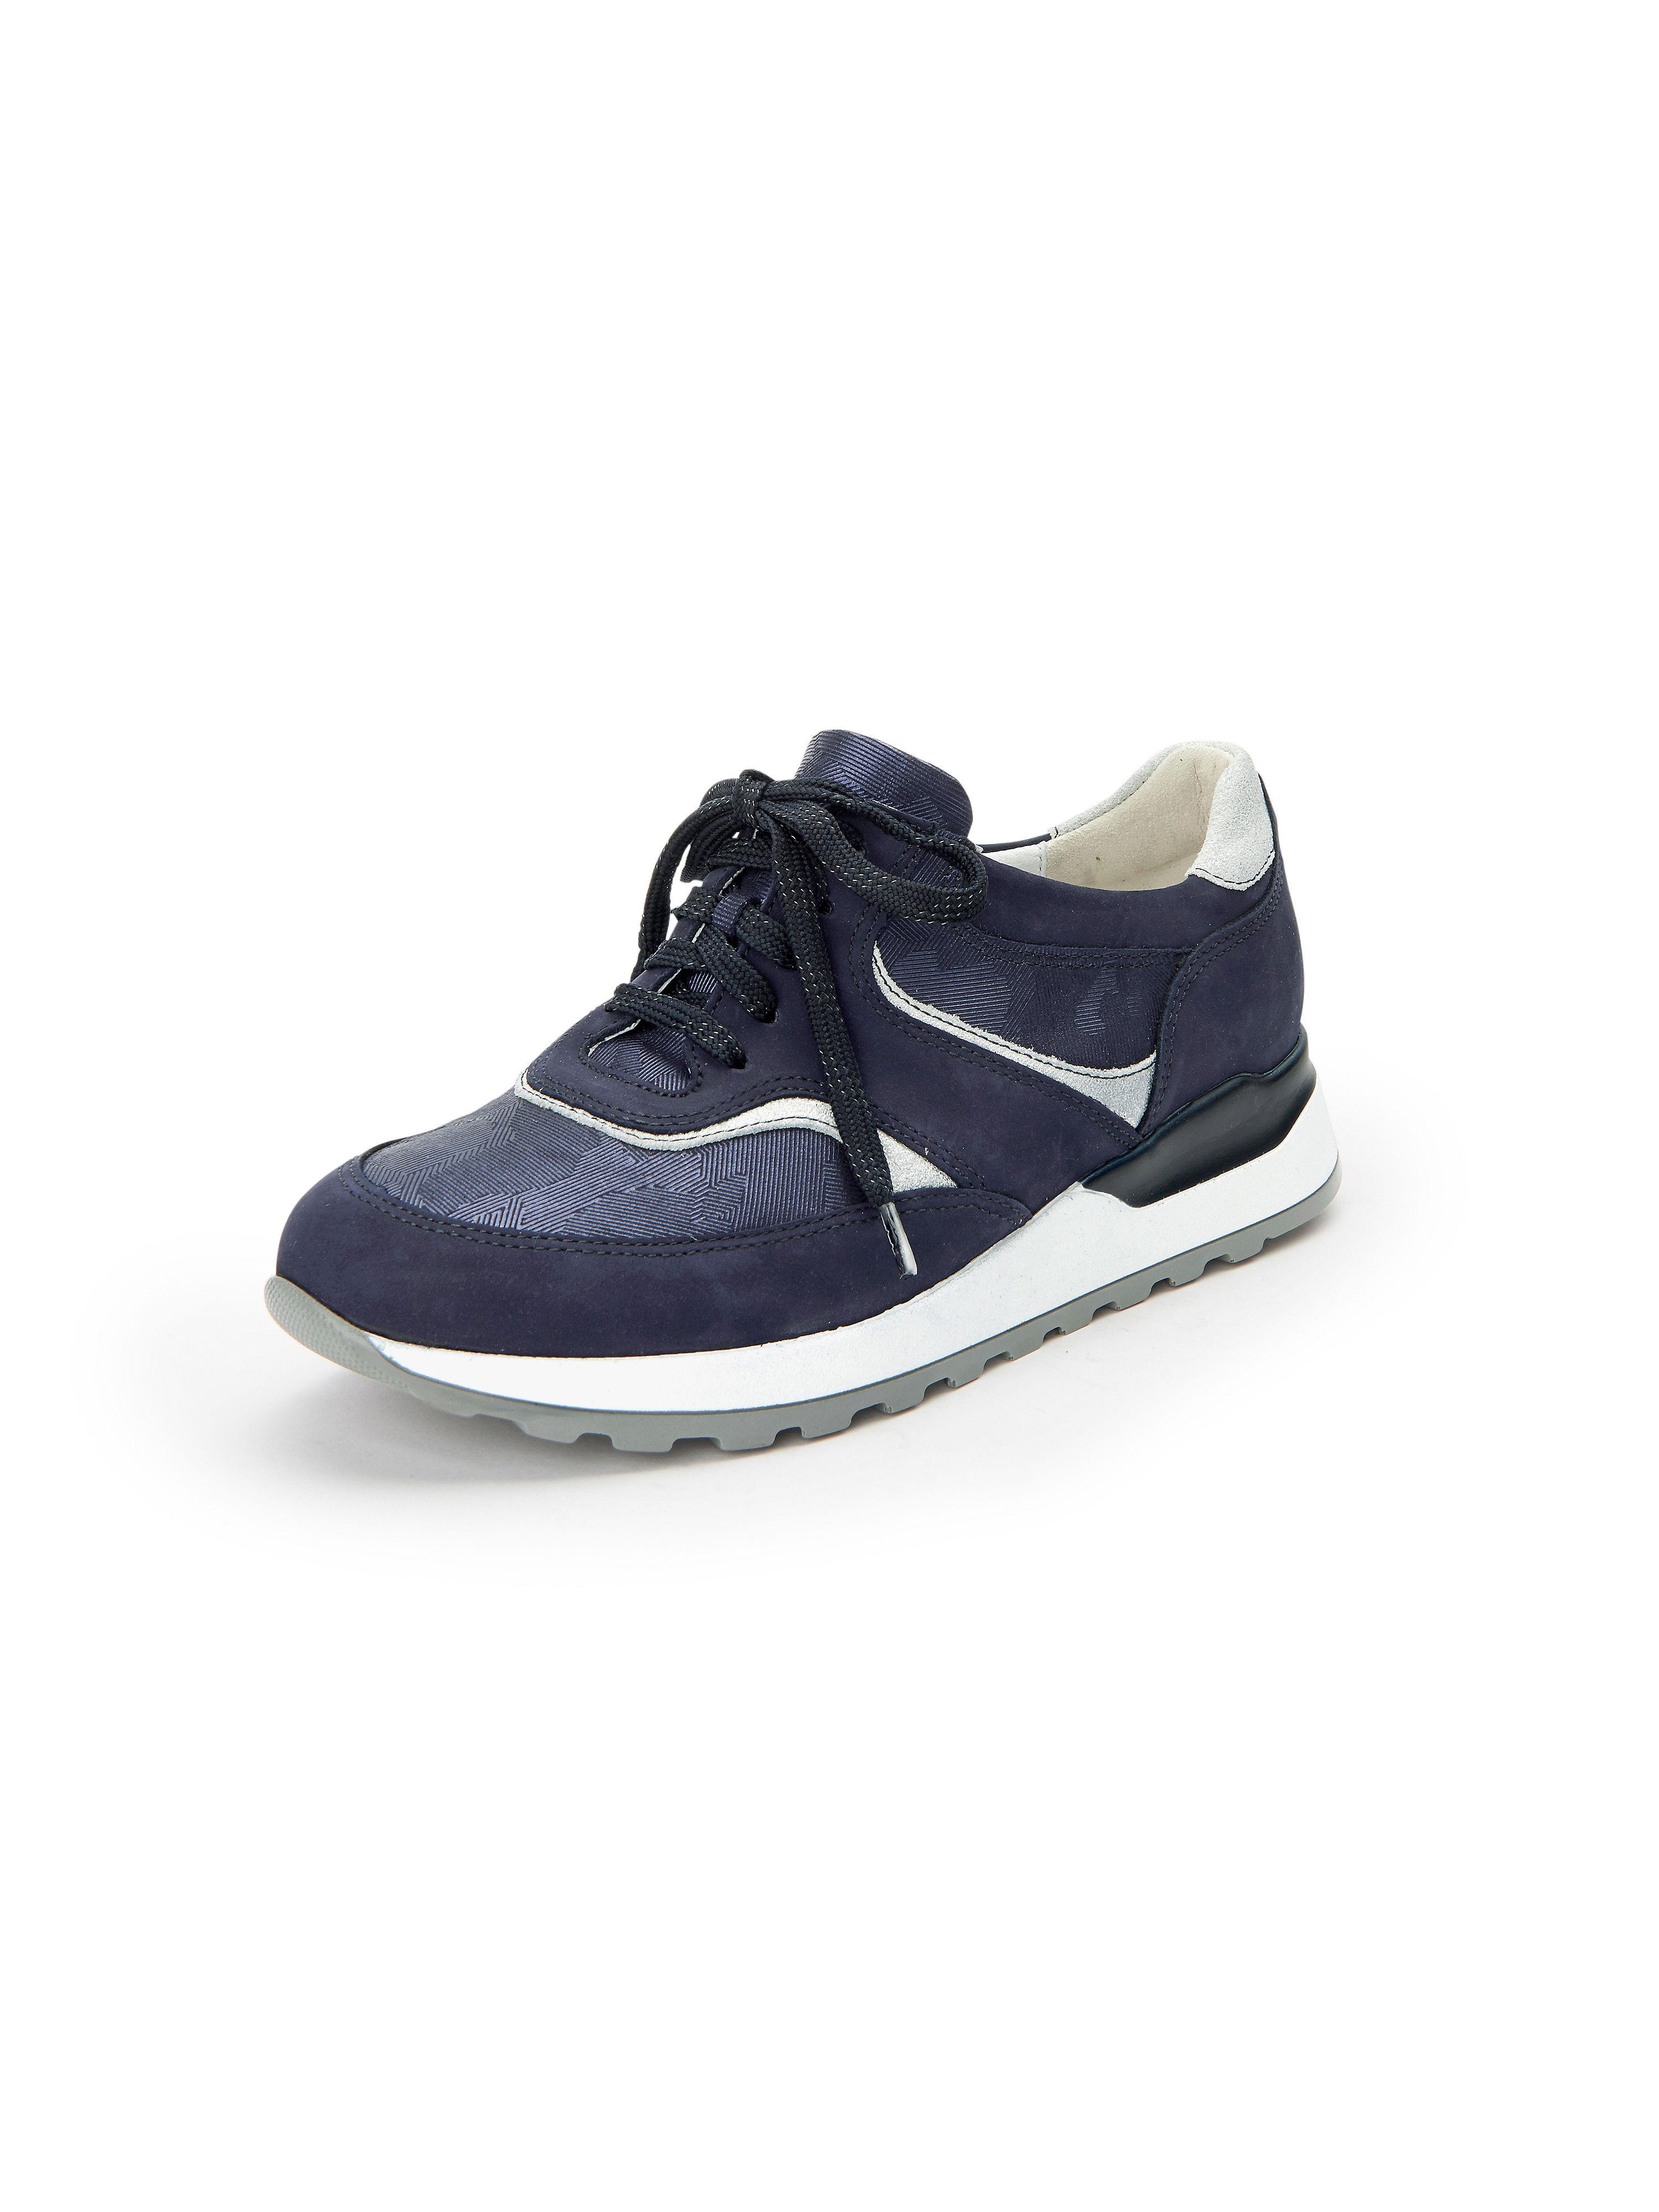 Les sneakers Hiroko cuir, style sport Waldläufer bleu taille 37